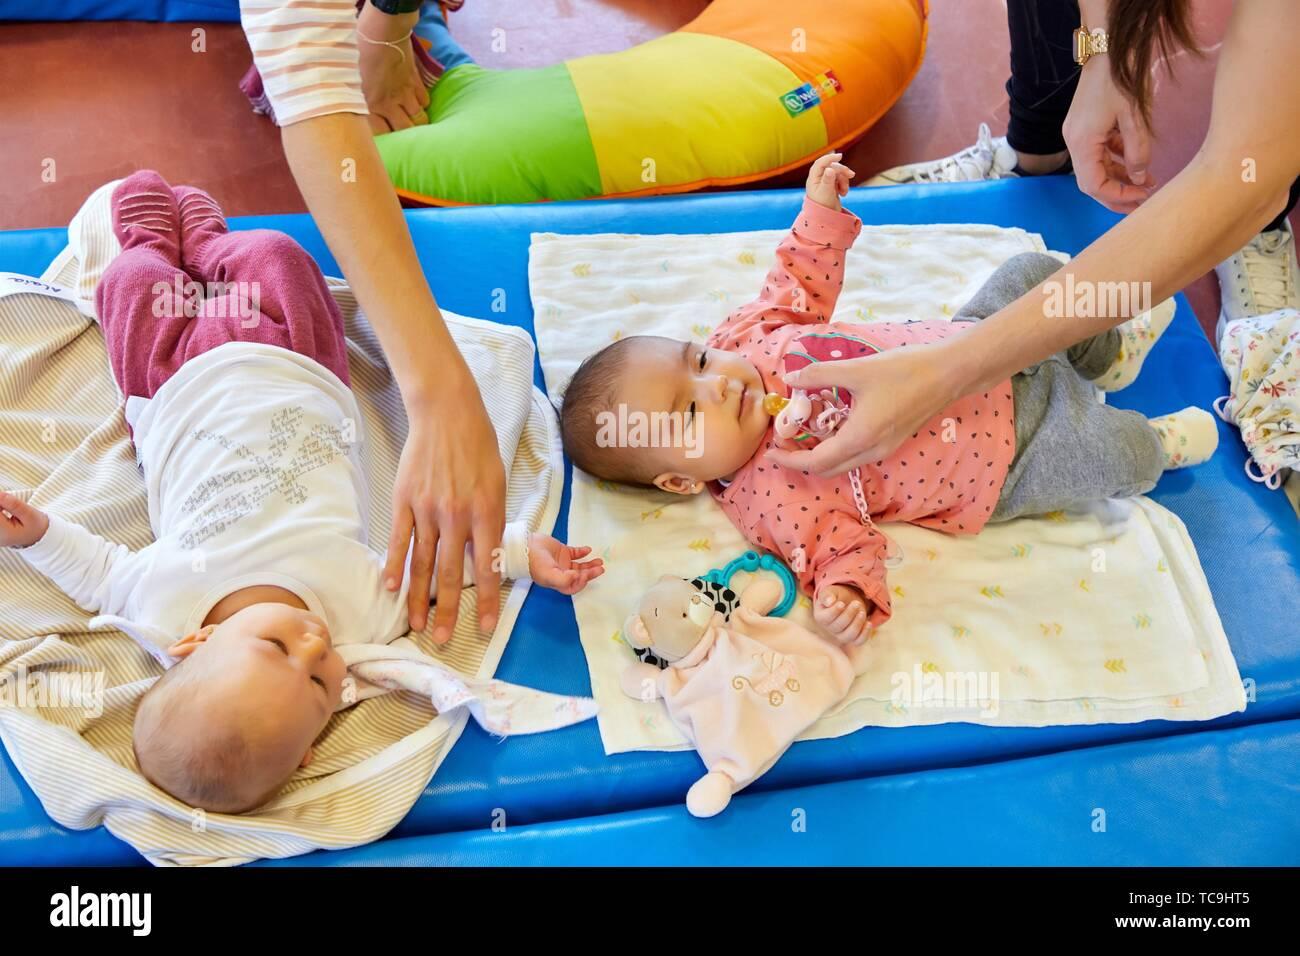 Las madres con bebés en el posparto gimnasia, centro de salud, Zarautz, Gipuzkoa, País Vasco, España Foto de stock